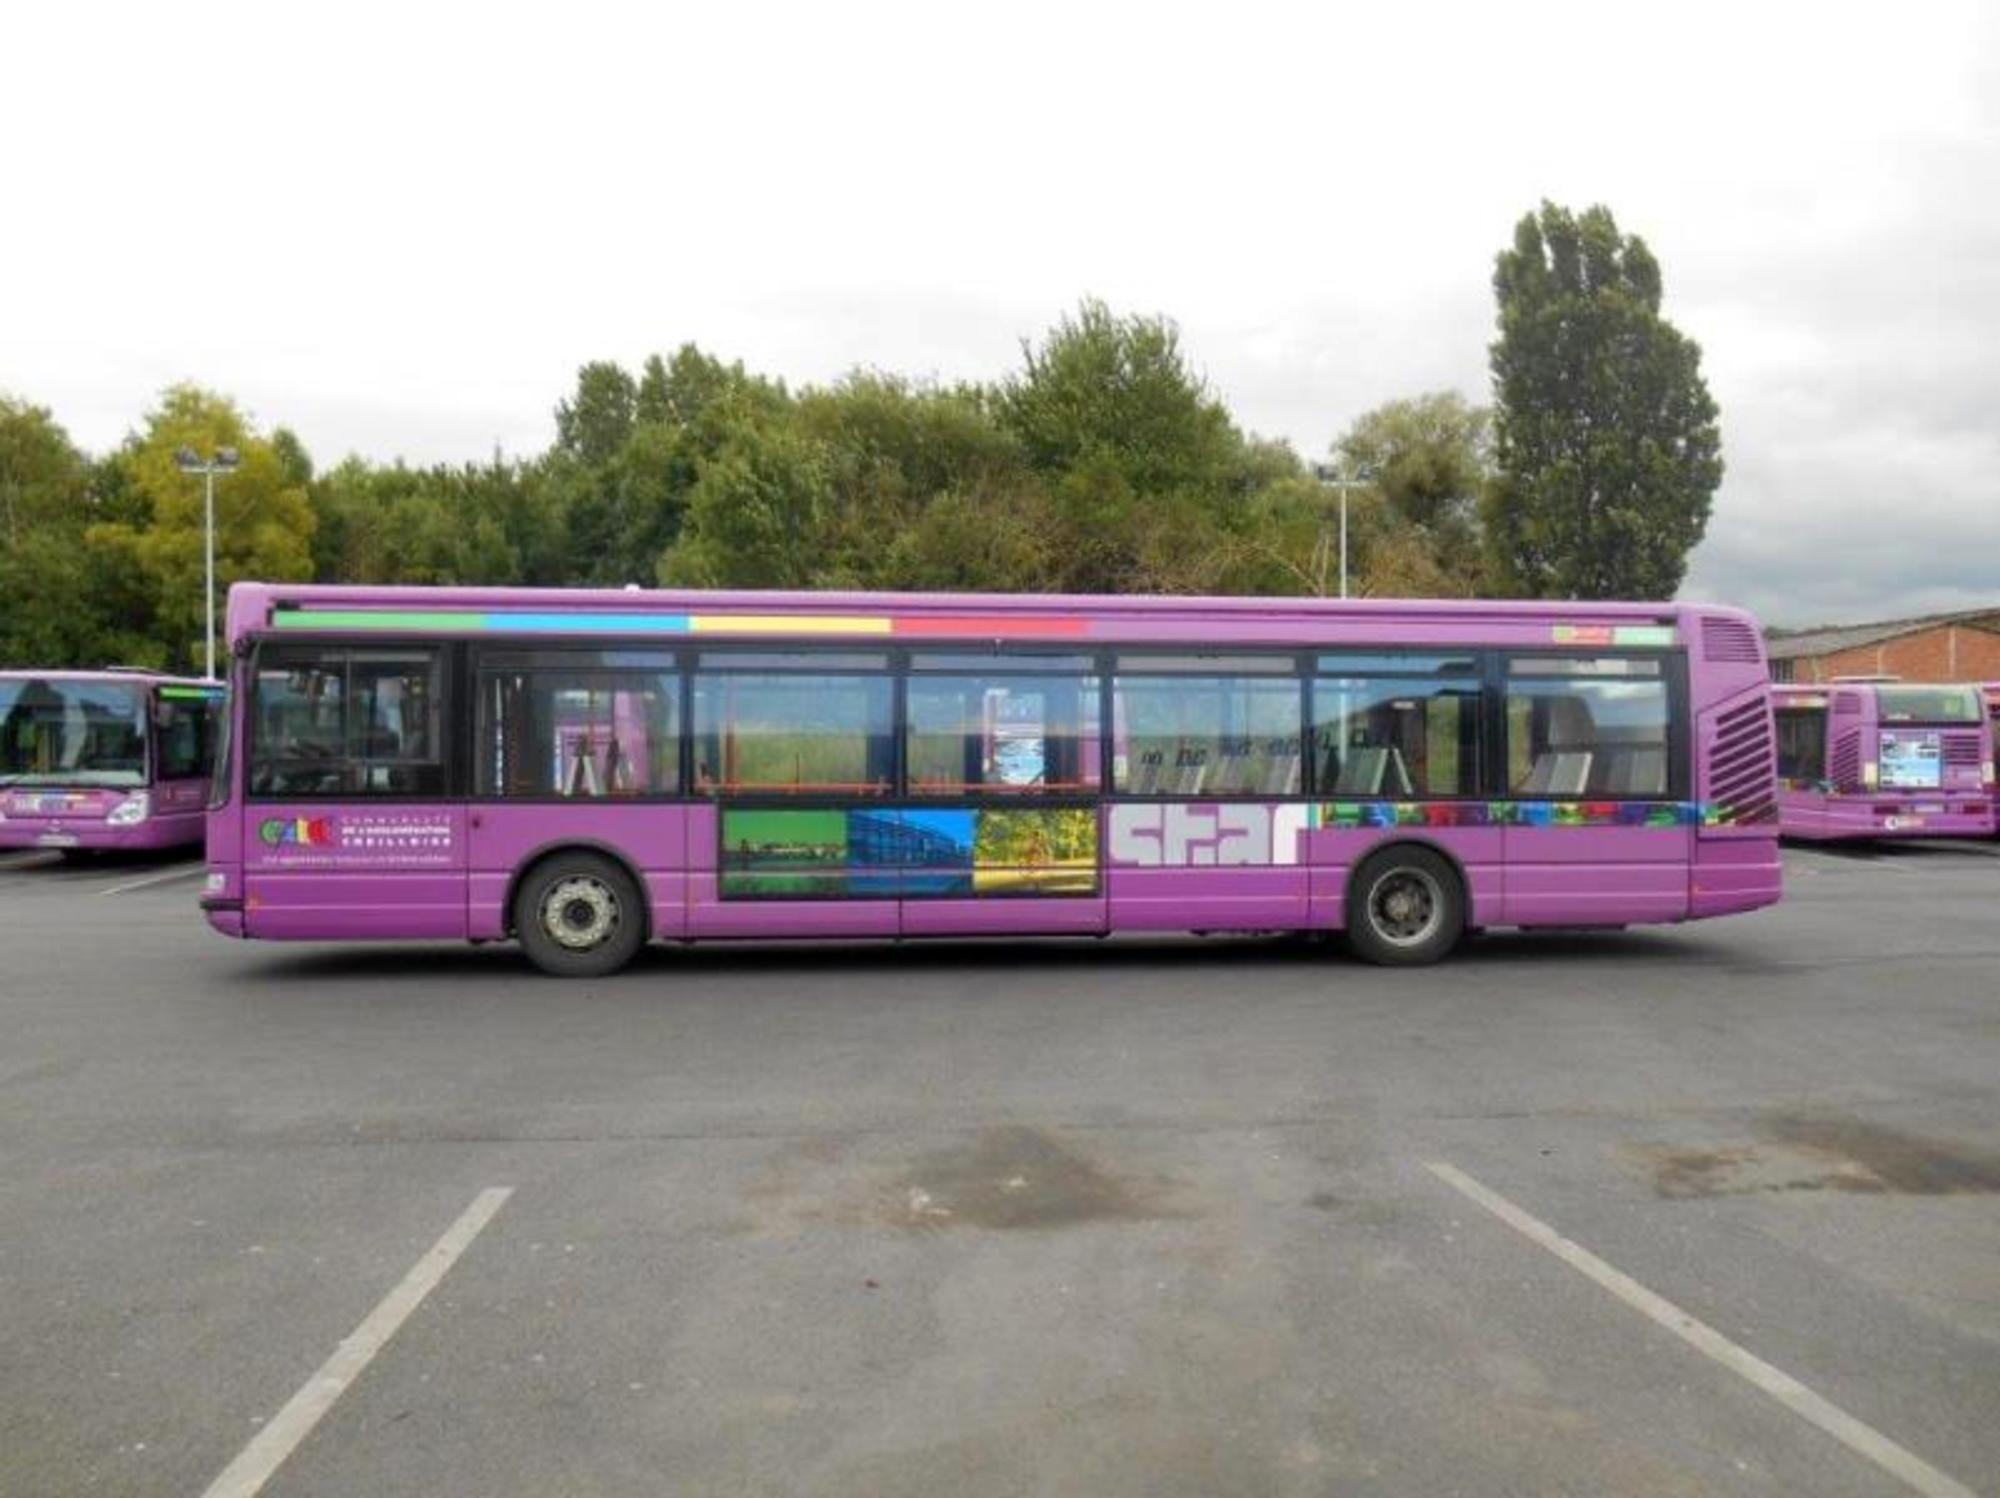 bus renault agora standard car bus d 39 occasion aux. Black Bedroom Furniture Sets. Home Design Ideas